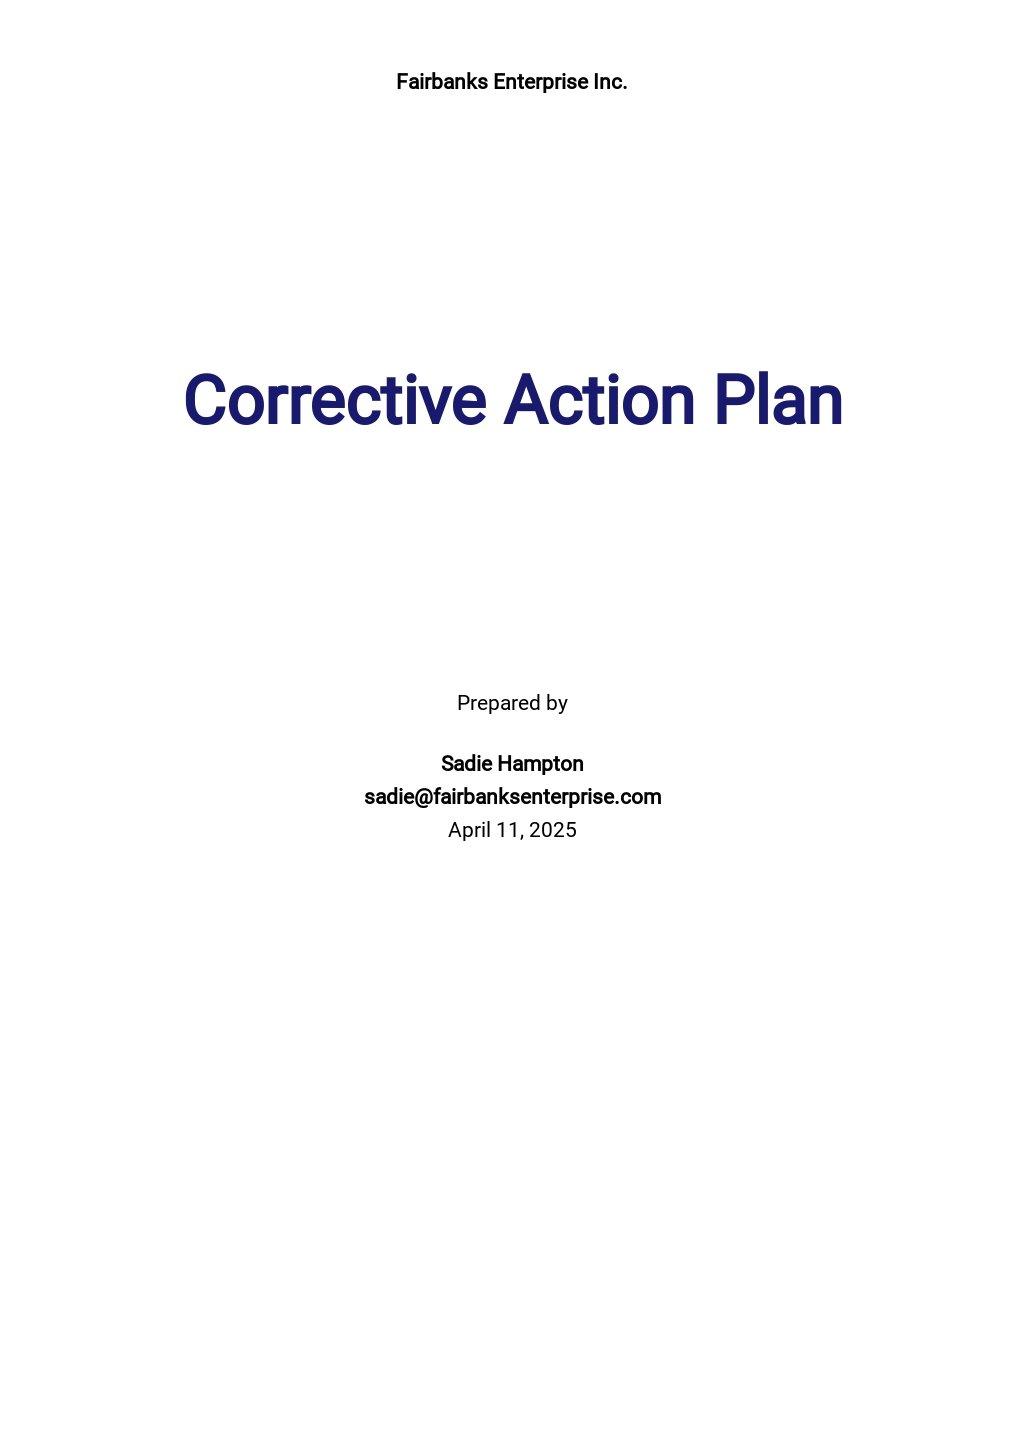 Corrective Action Plan Template .jpe